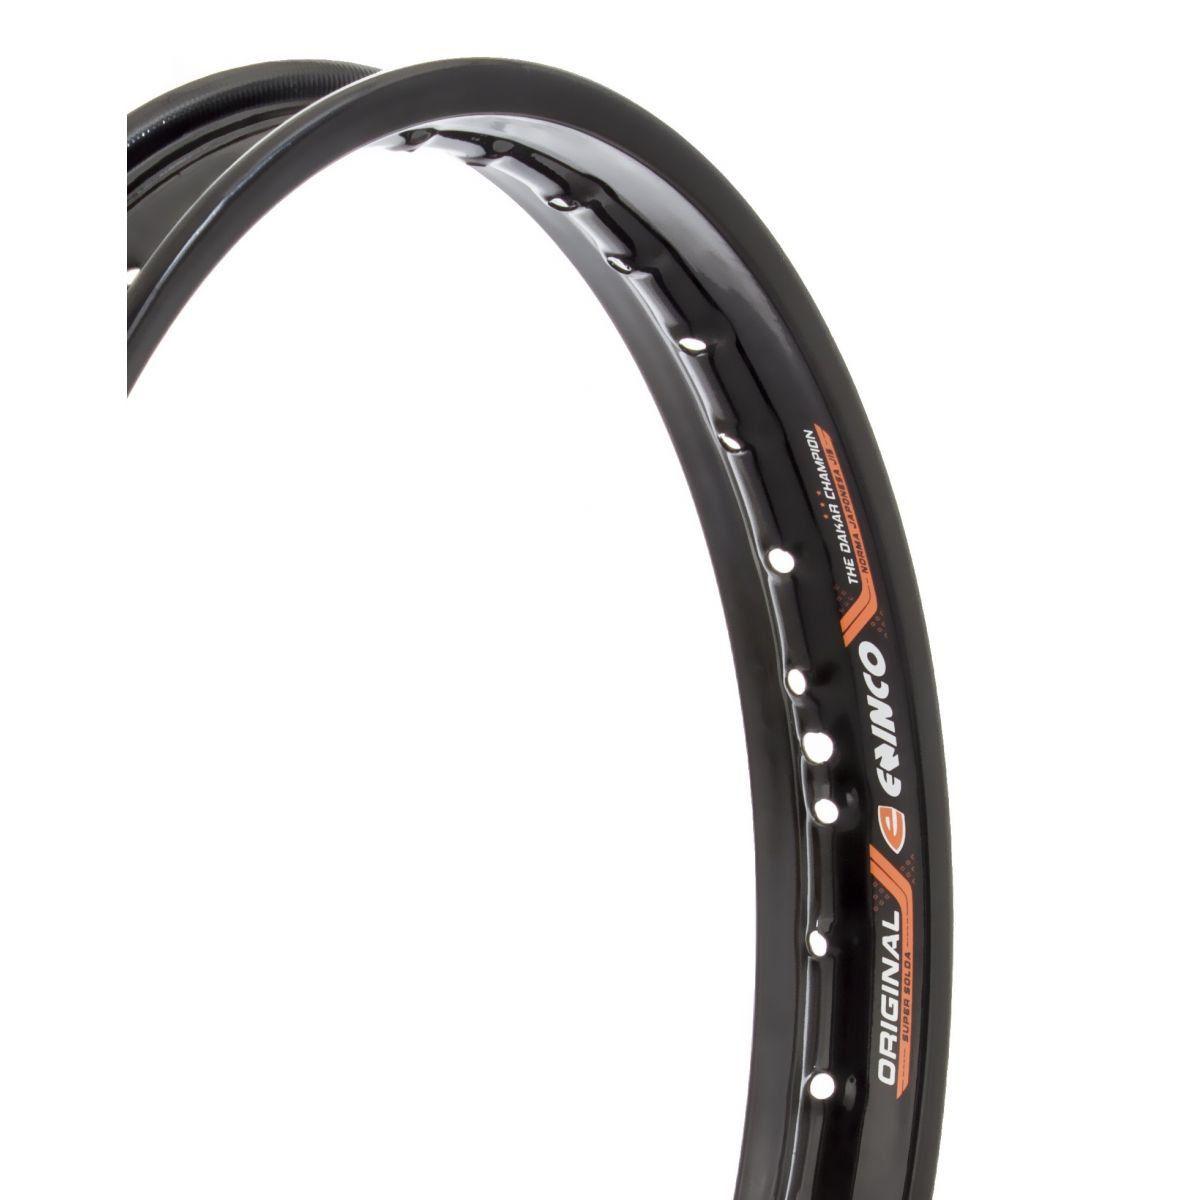 Aro de Moto Dianteiro Honda NXR Bros 125 / 150 - 1.85 X 19 - Preto - Eninco